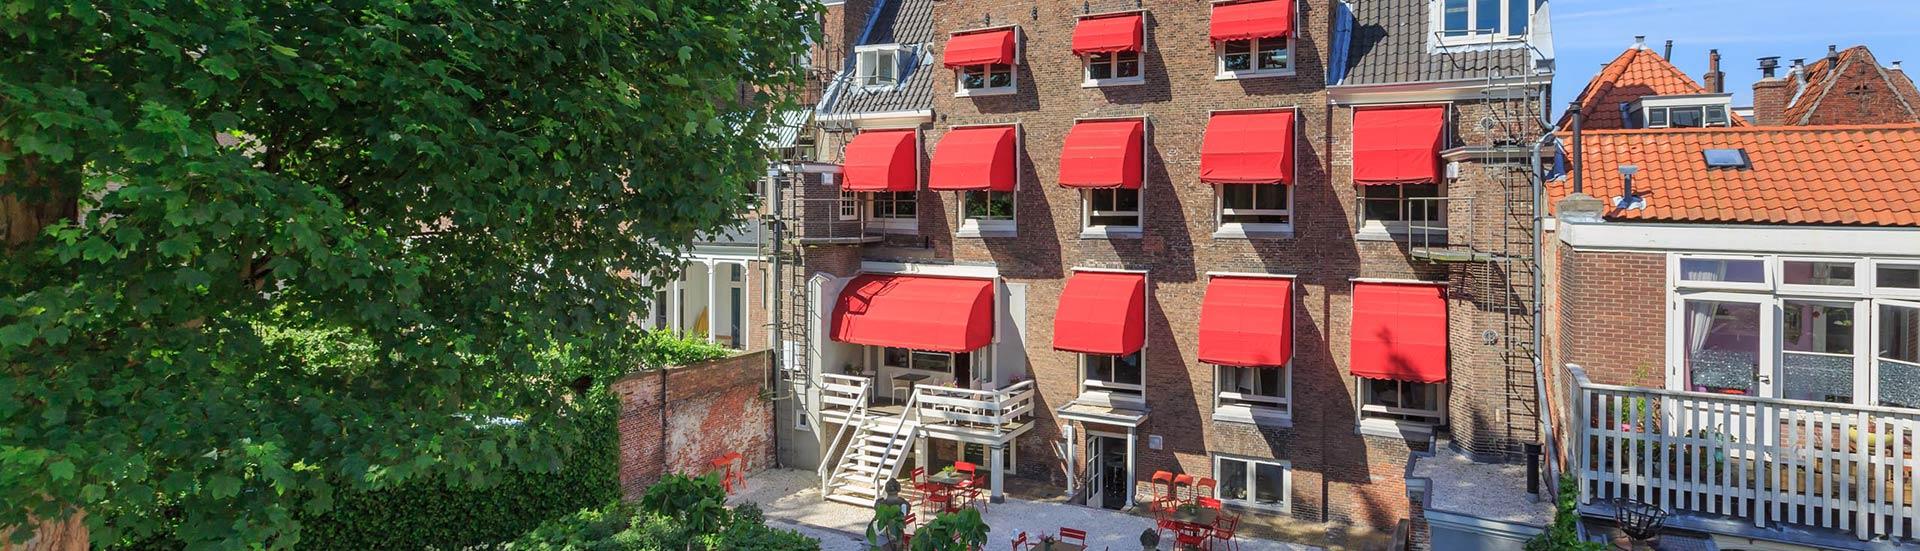 Haarlem online